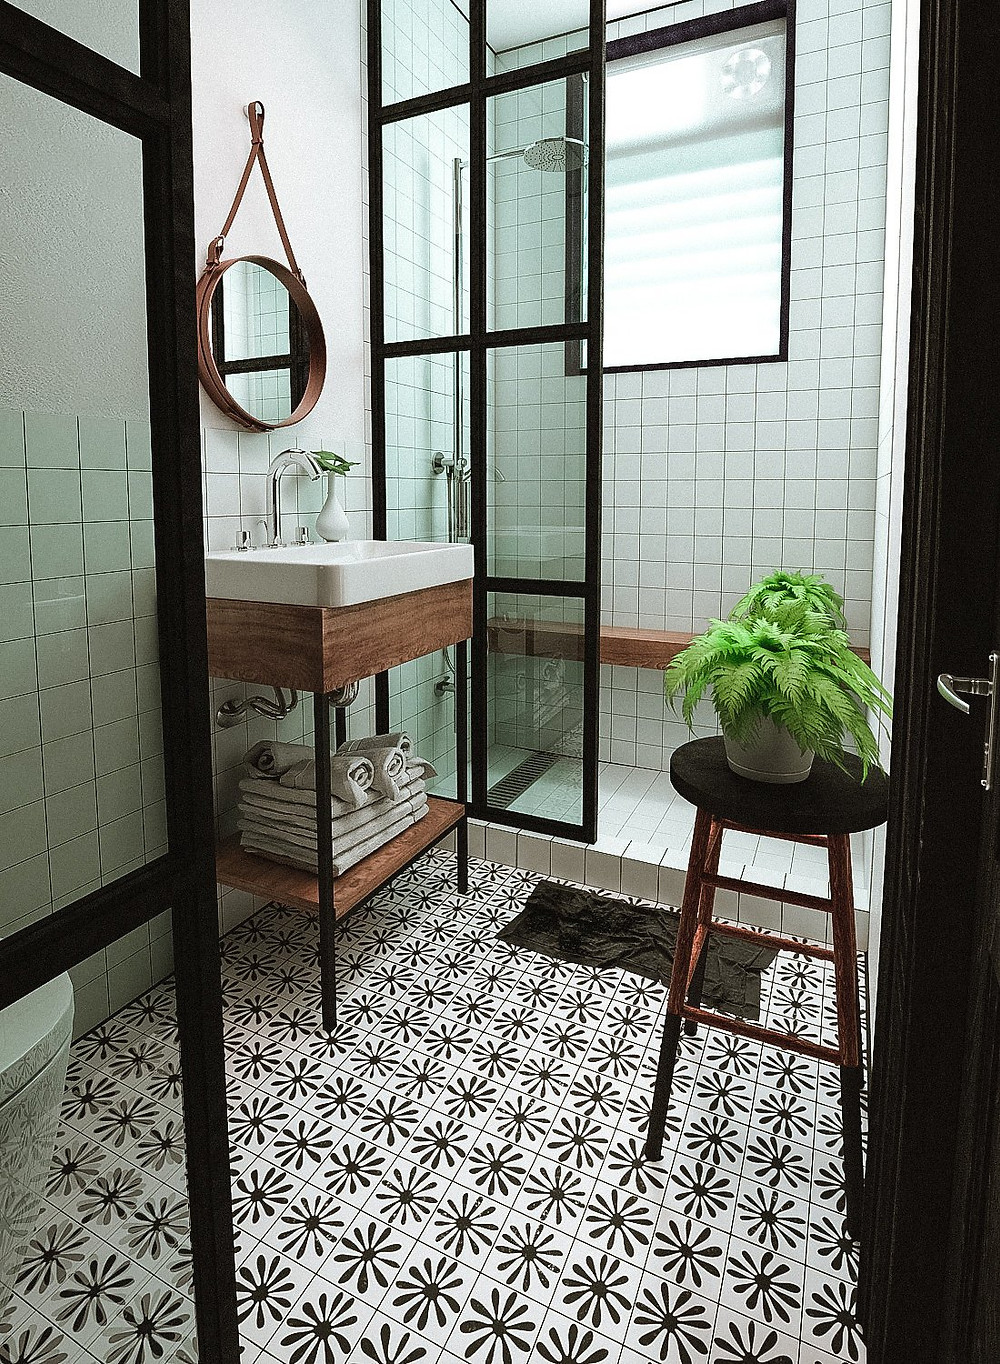 Chamomile Tile Stencils Kit from ETSY applied on bathroom floor